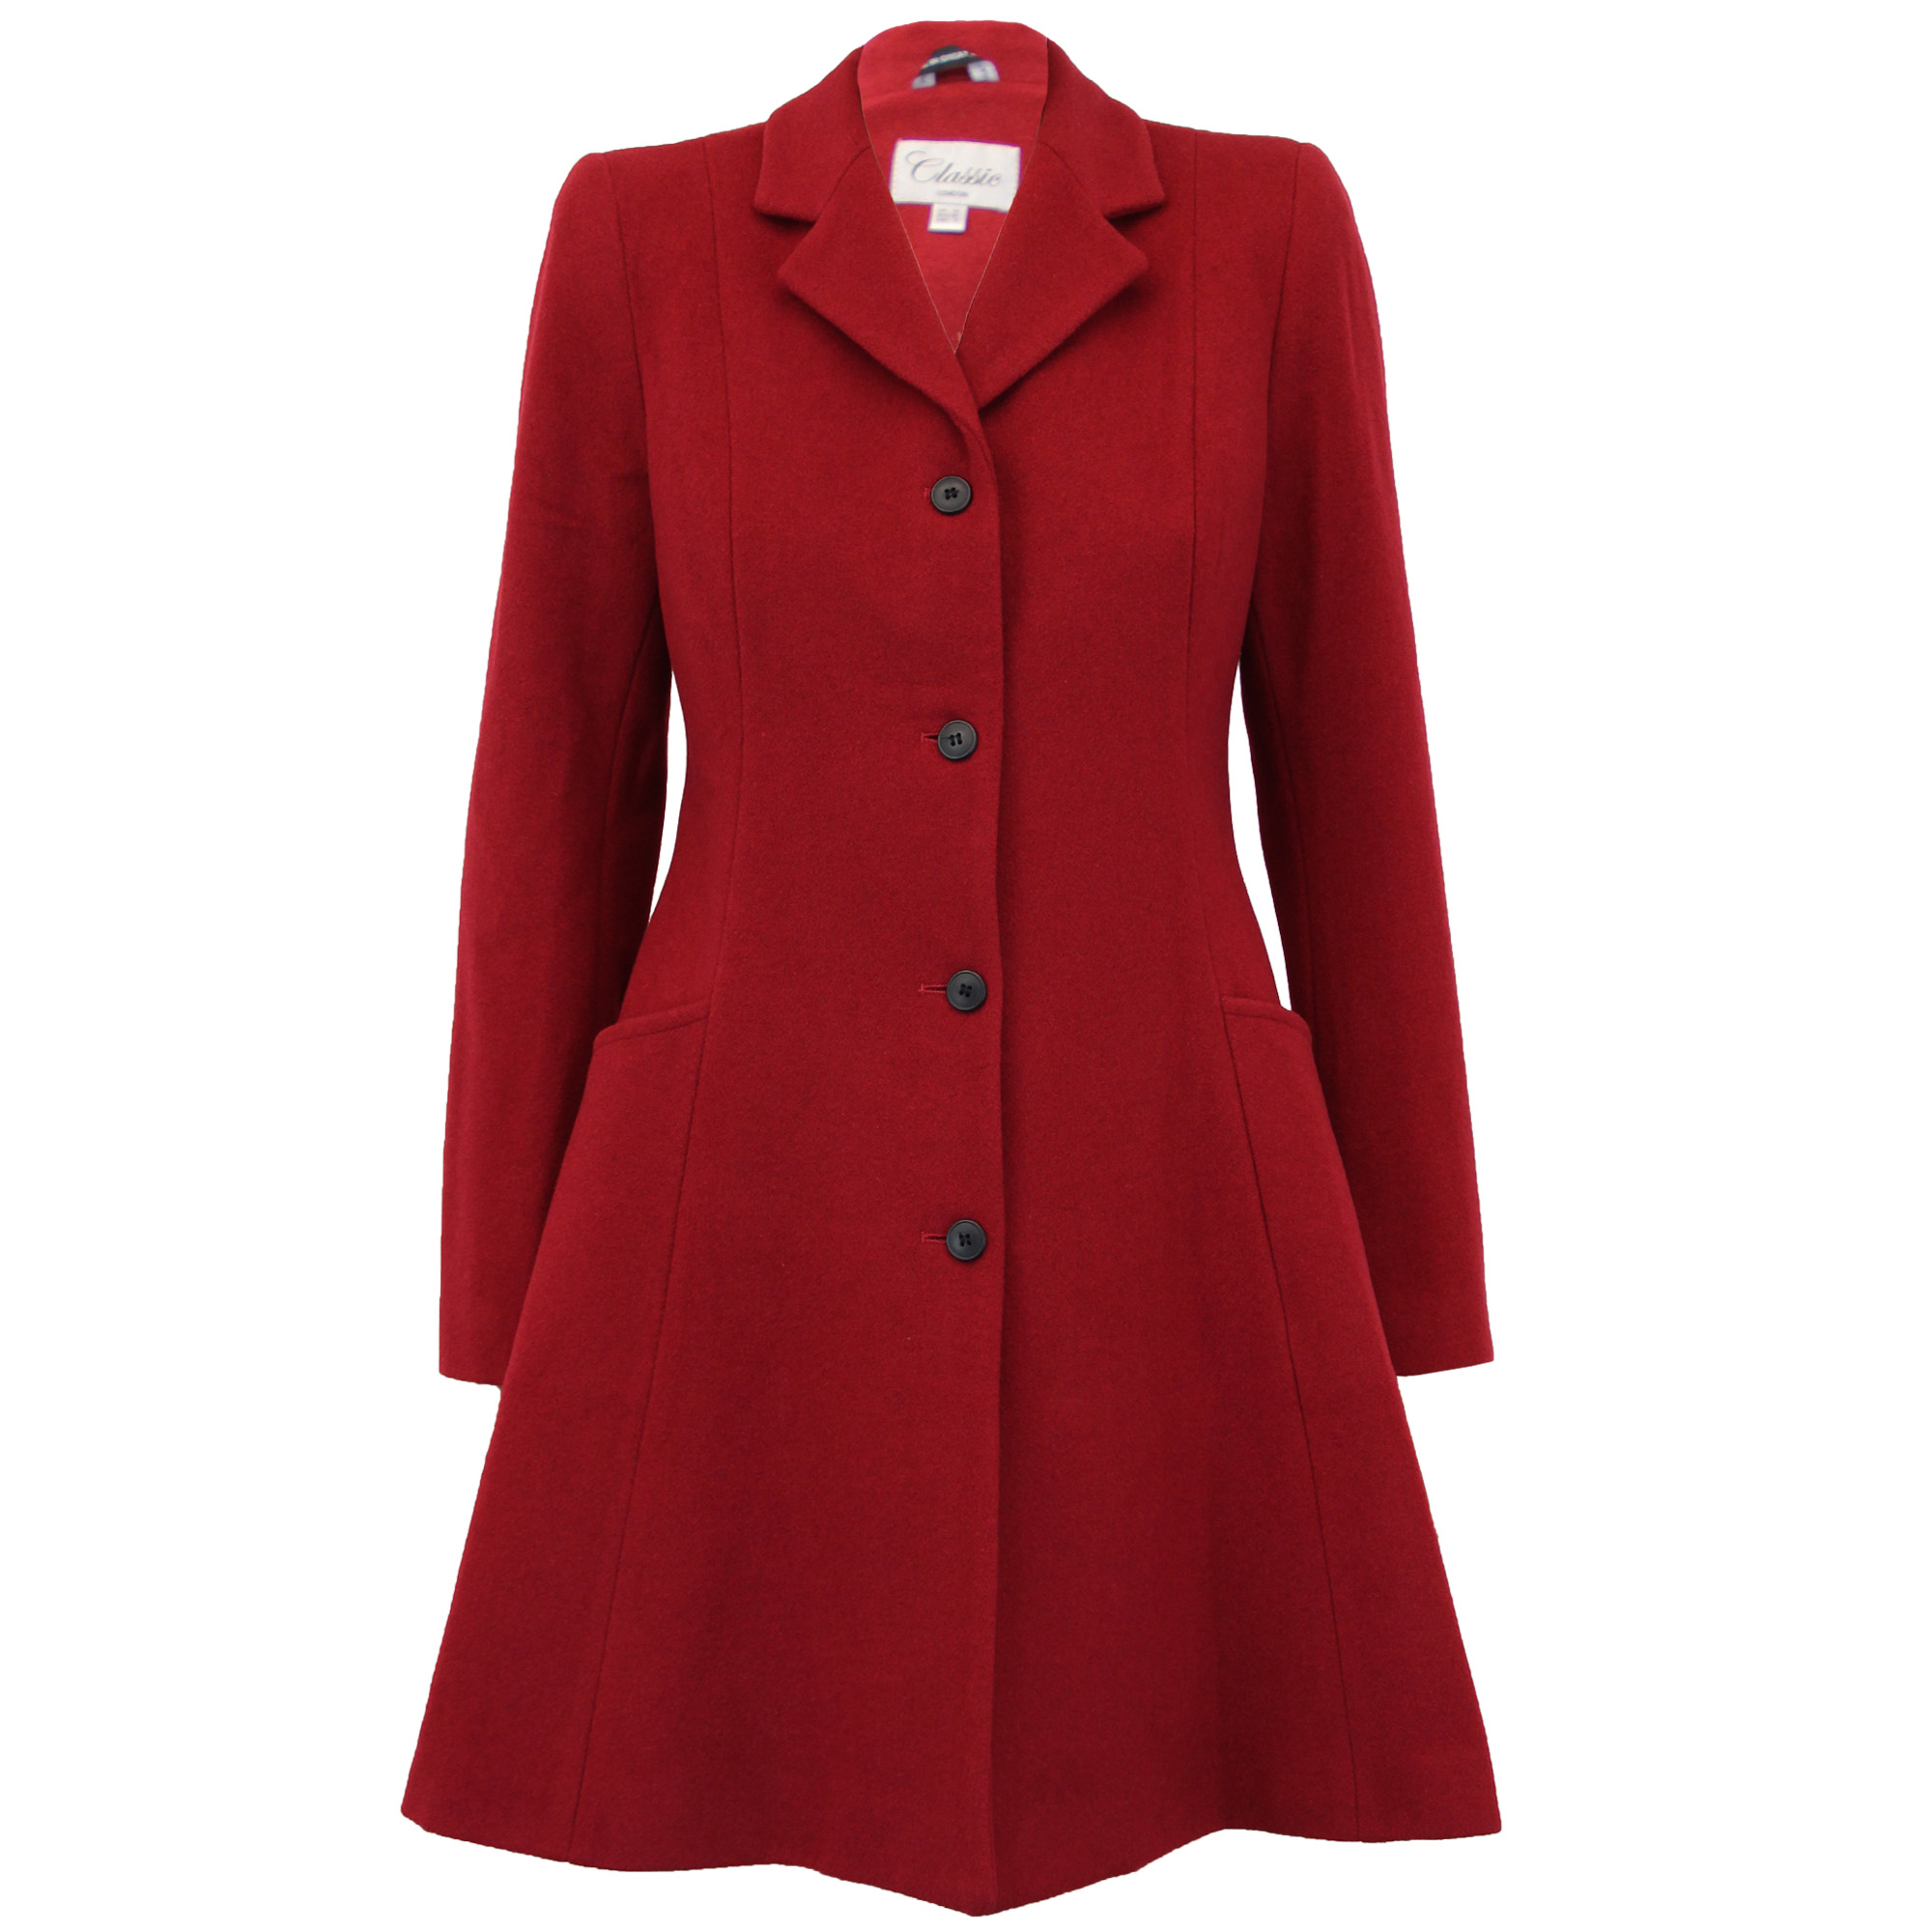 Winter coats for women uk